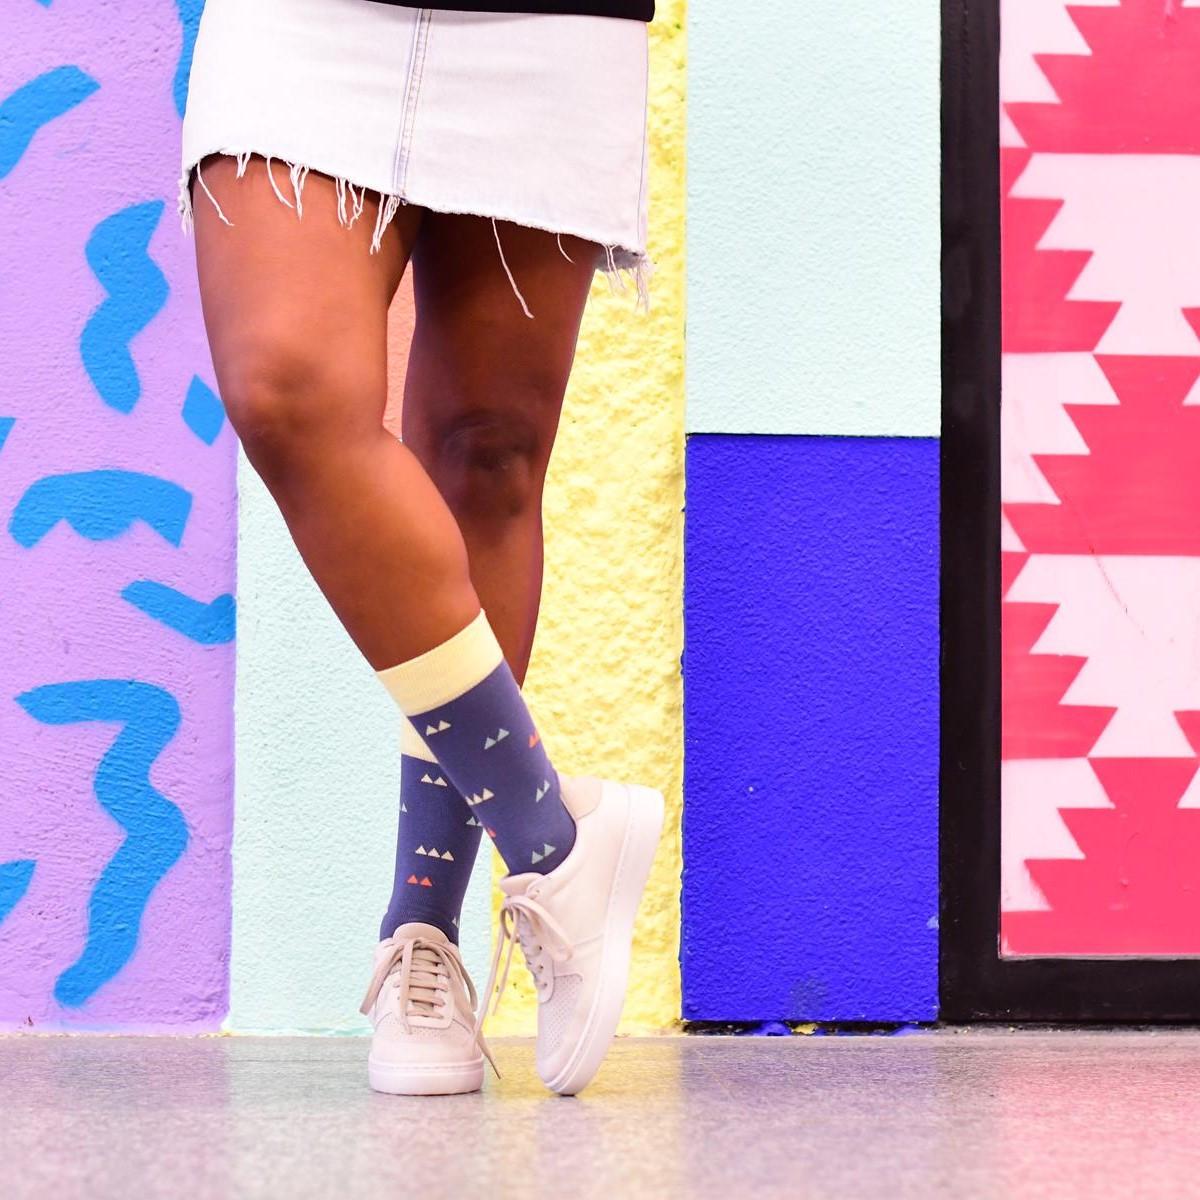 AmorSocks-calcetines-socks-colaboracion-barqet-triangulos-axioma-azul-rosa-blanco-edicion-limitada